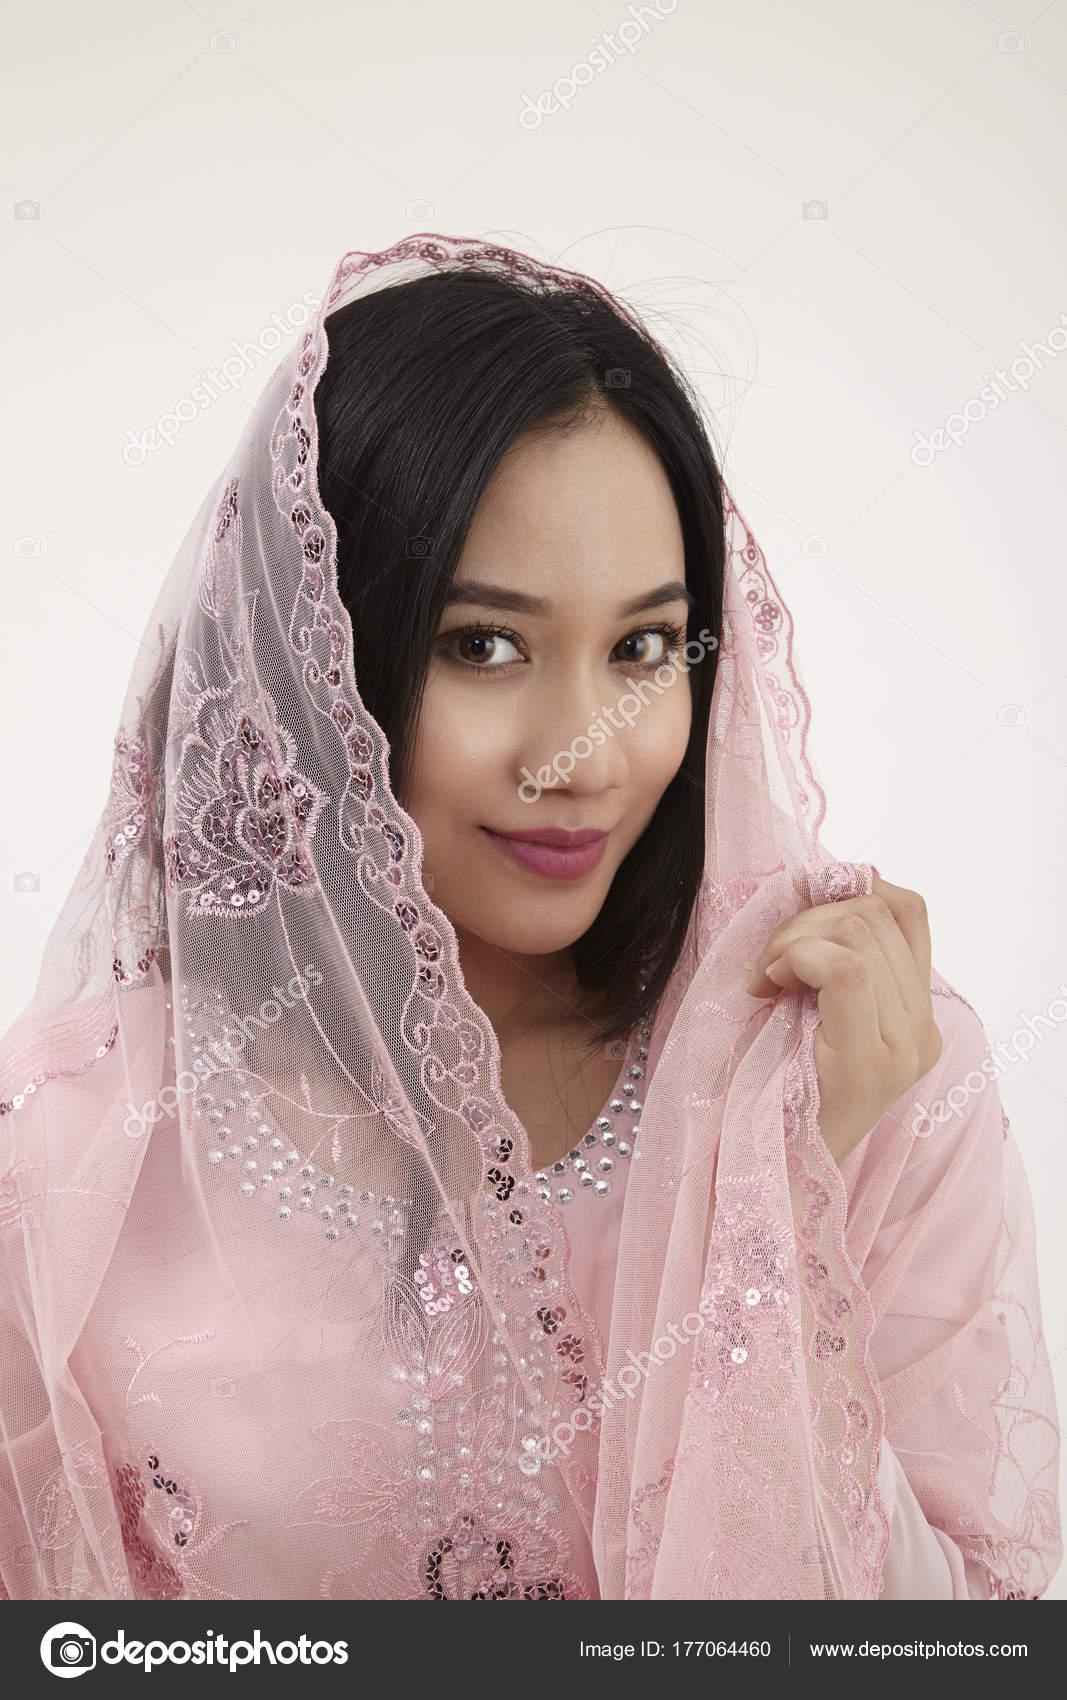 Mujer Malaya Ropa Rosa Baju Kurung Tradicional Posando Estudio ...